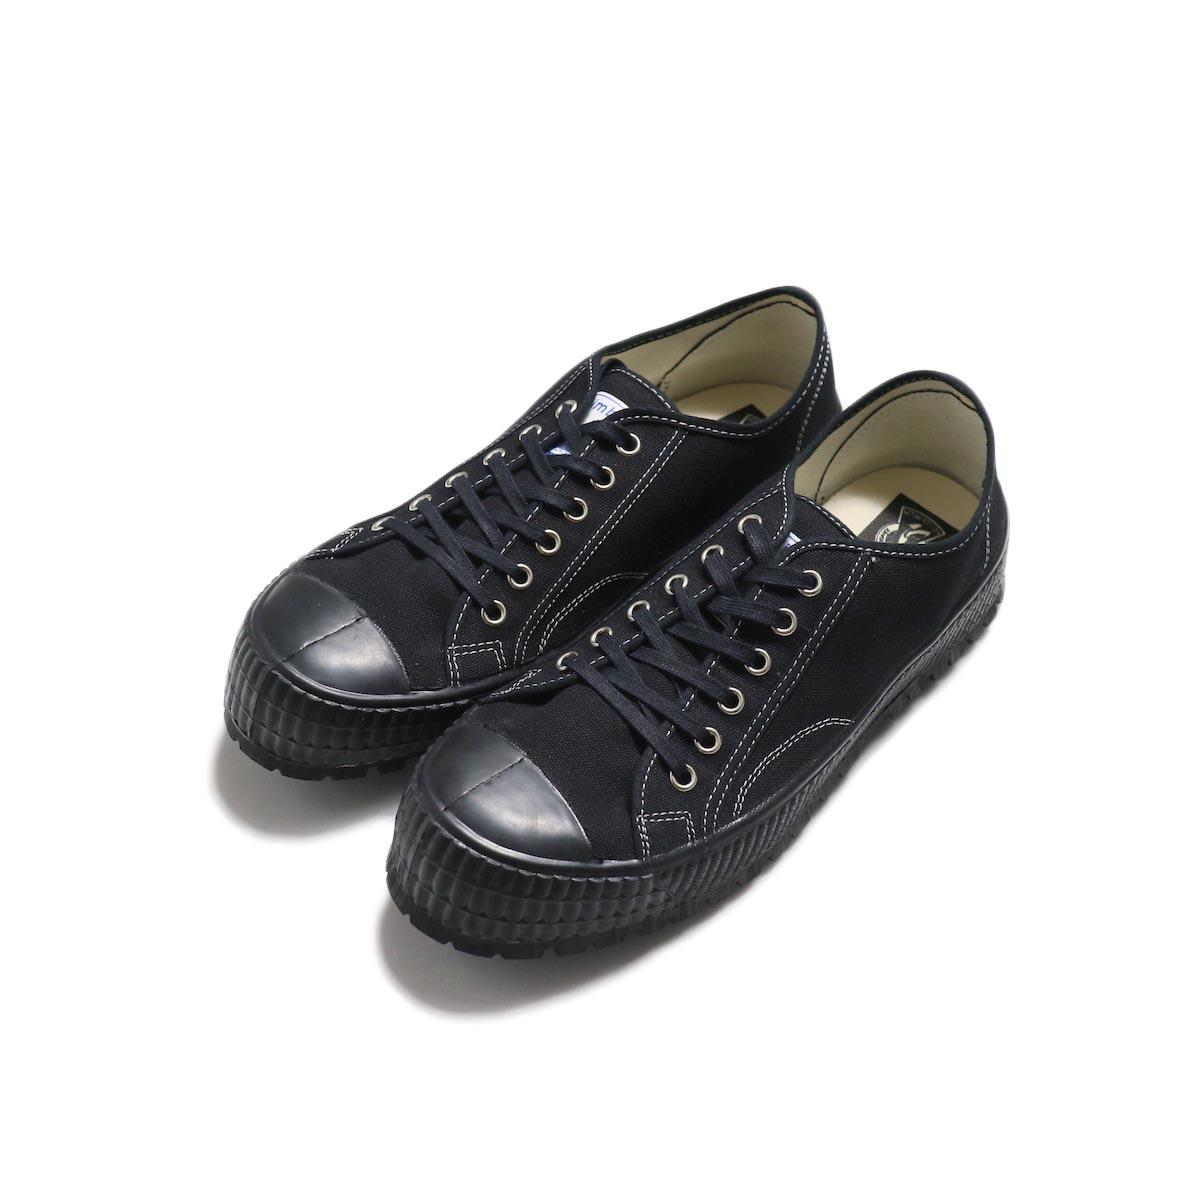 ZDA / 2100-F Climber Sole Cnavas Sneaker (Black)全体